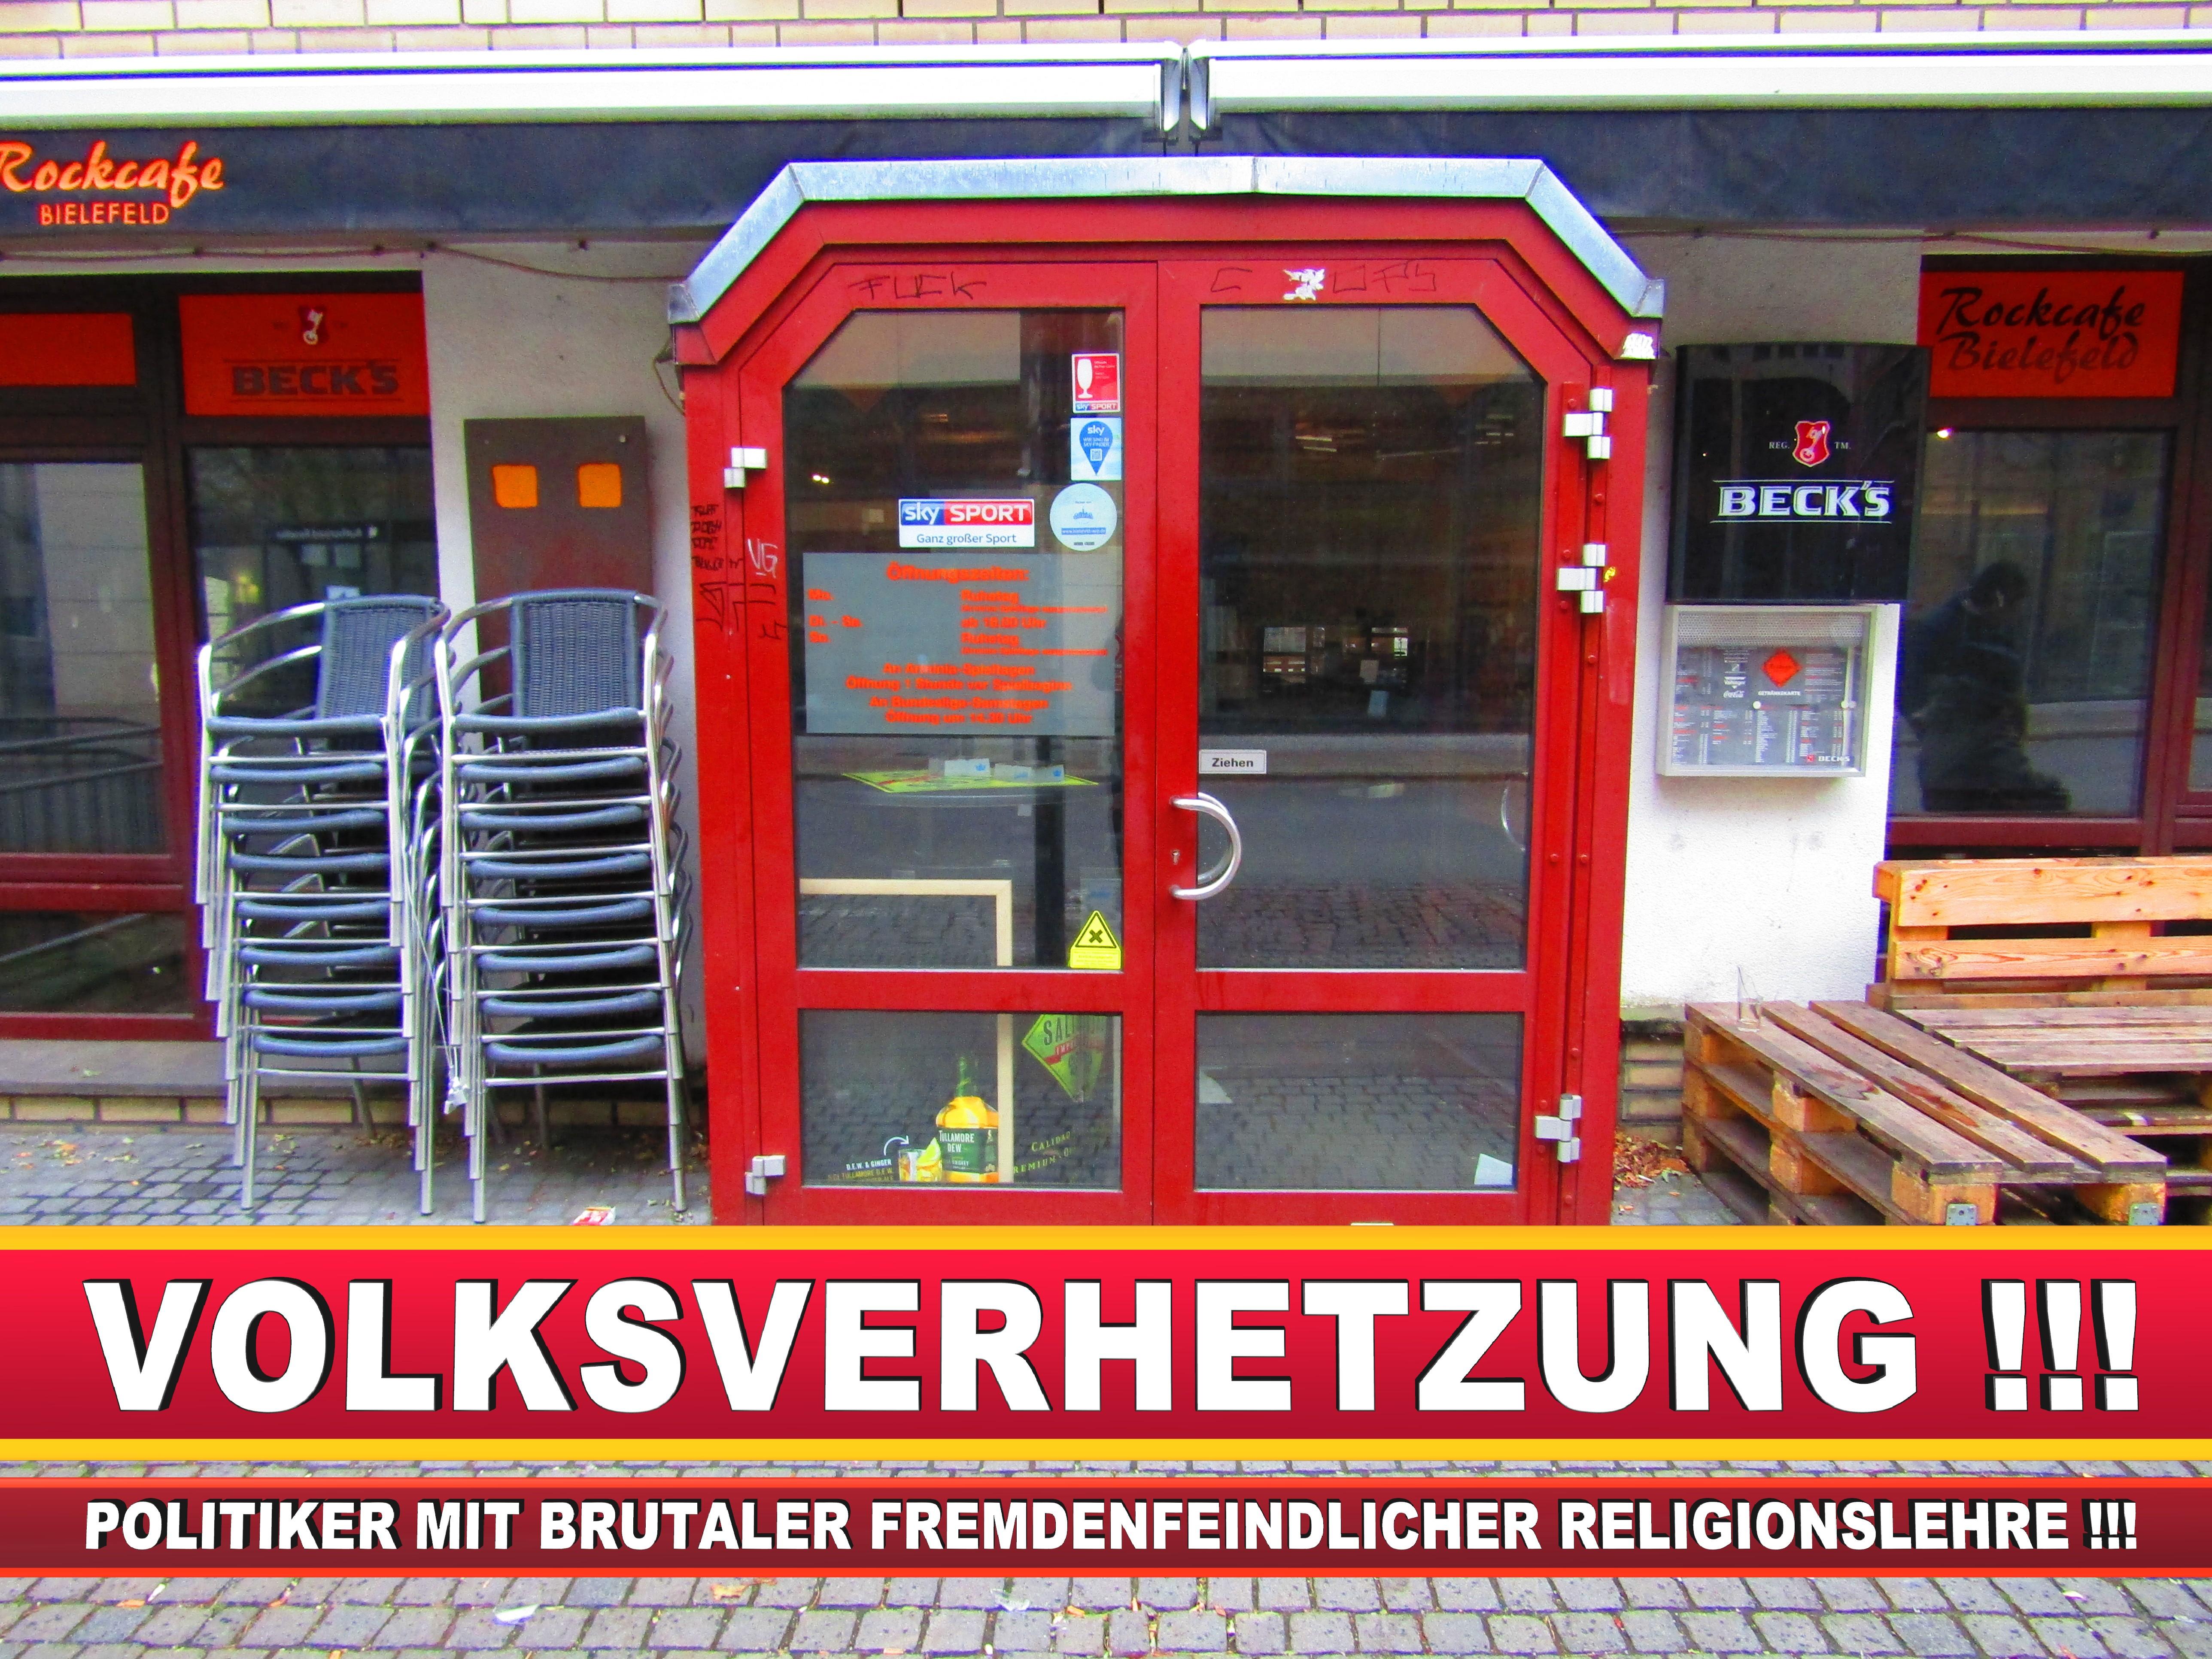 ROCKCAFE BIELEFELD NEUSTäDTER STR 25 33602 CDU BIELEFELD NRW (1)